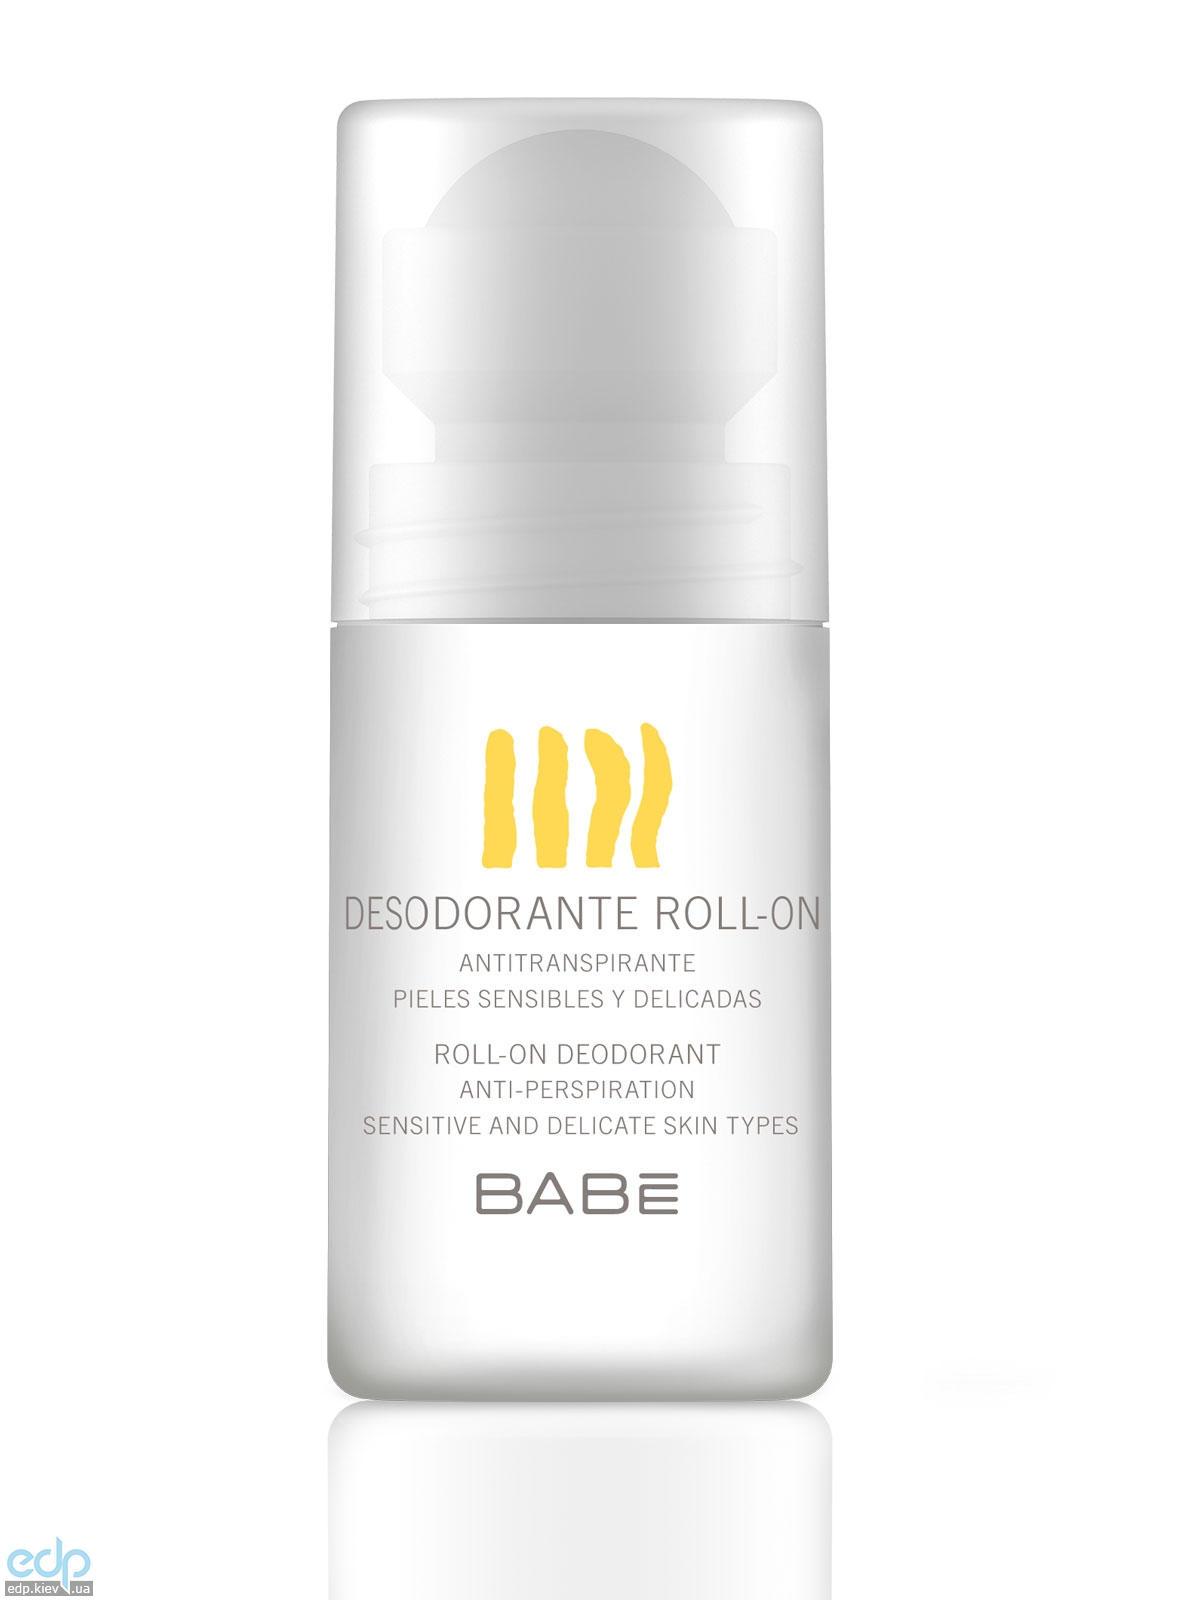 Babe Laboratorios - Дезодорант шариковый - 50 ml (арт. 158278249)